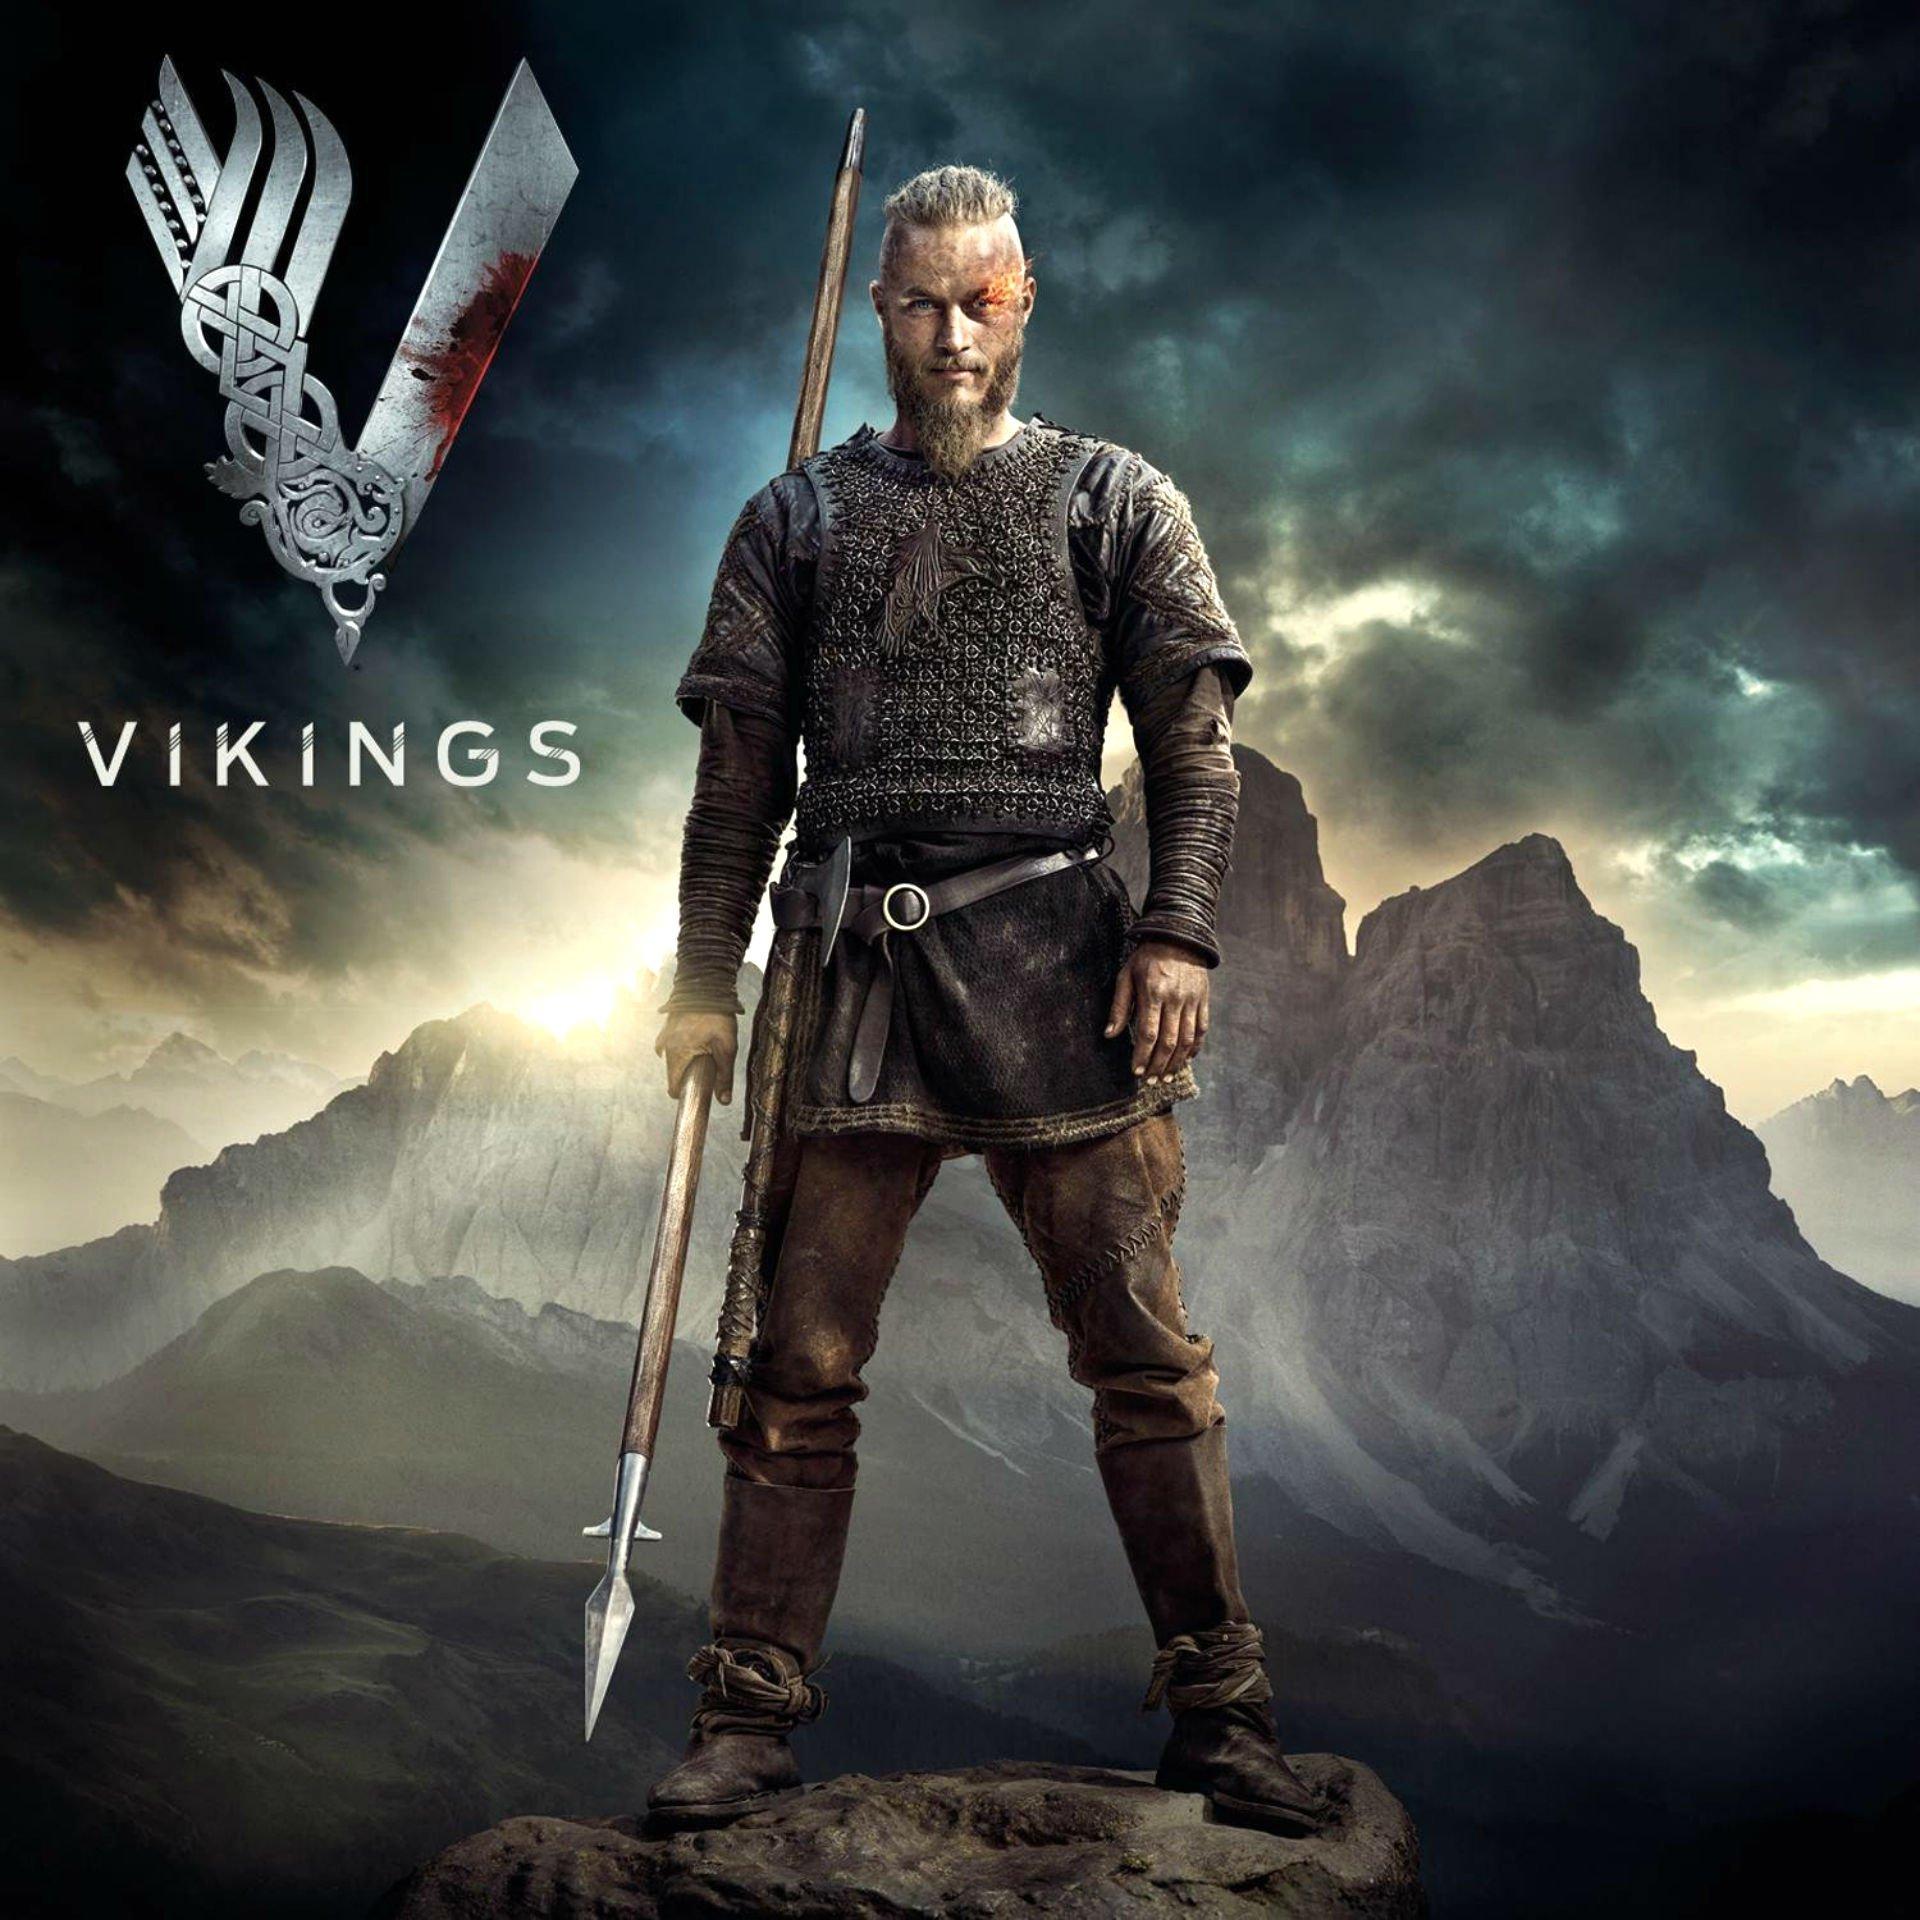 fantasy adventure series 1vikings viking warrior wallpaper background 1920x1920